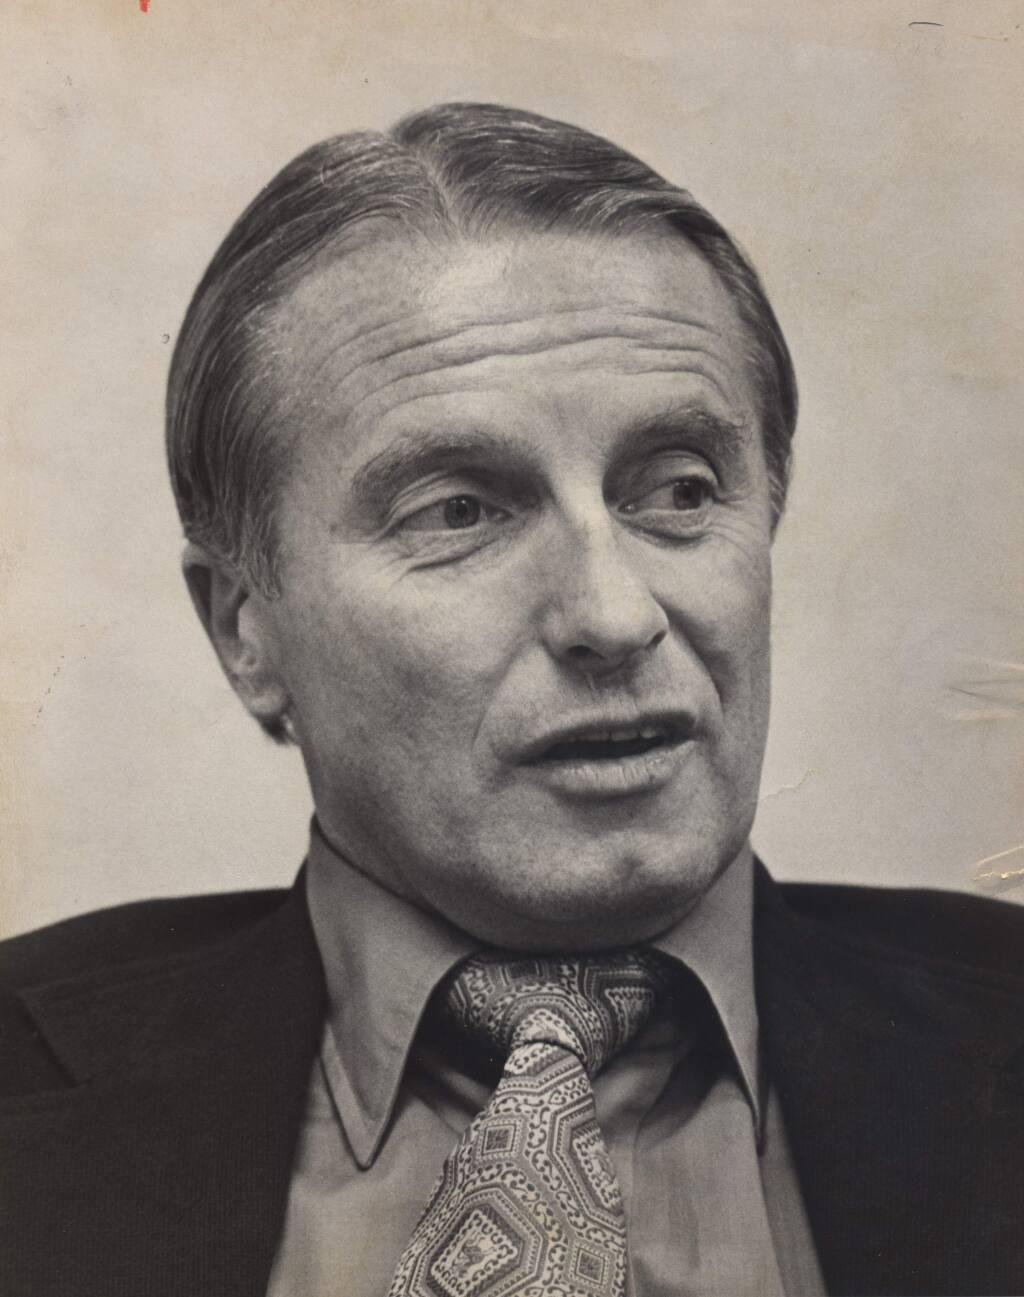 Brad Lundborg (Press Democrat files, 1976)